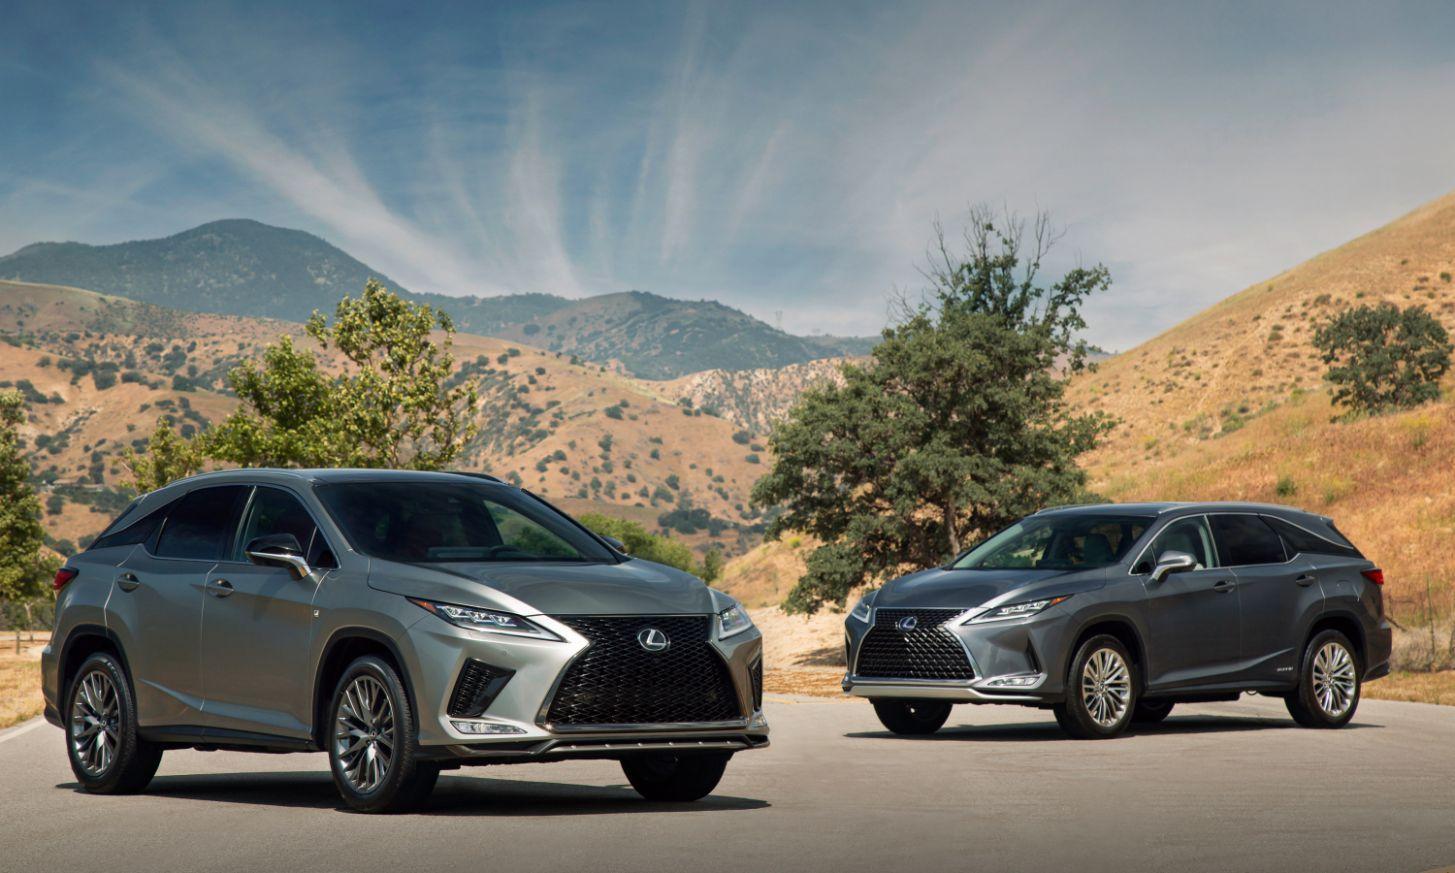 Lexus Hybrid 2020 New Model And Performance Di 2020